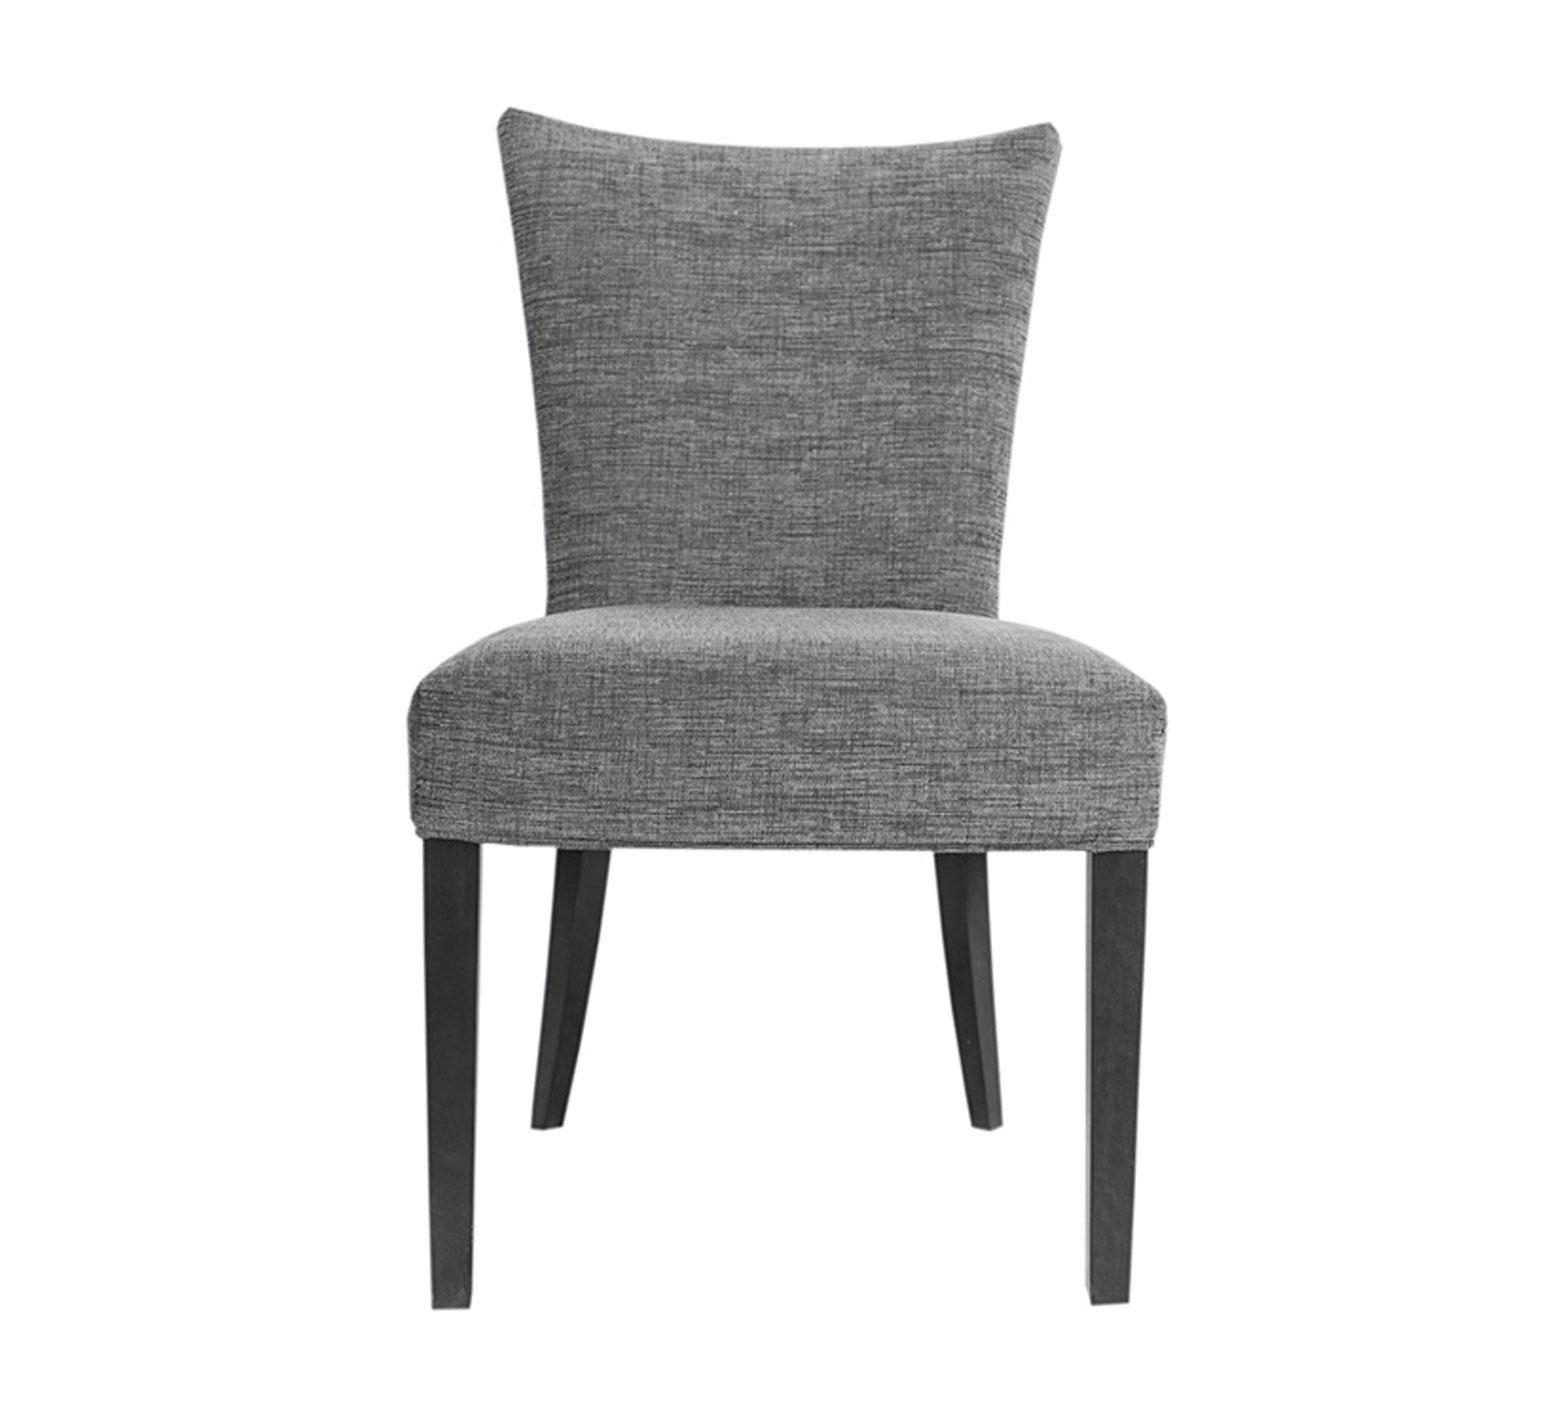 Bermex Side Chair C-1371U